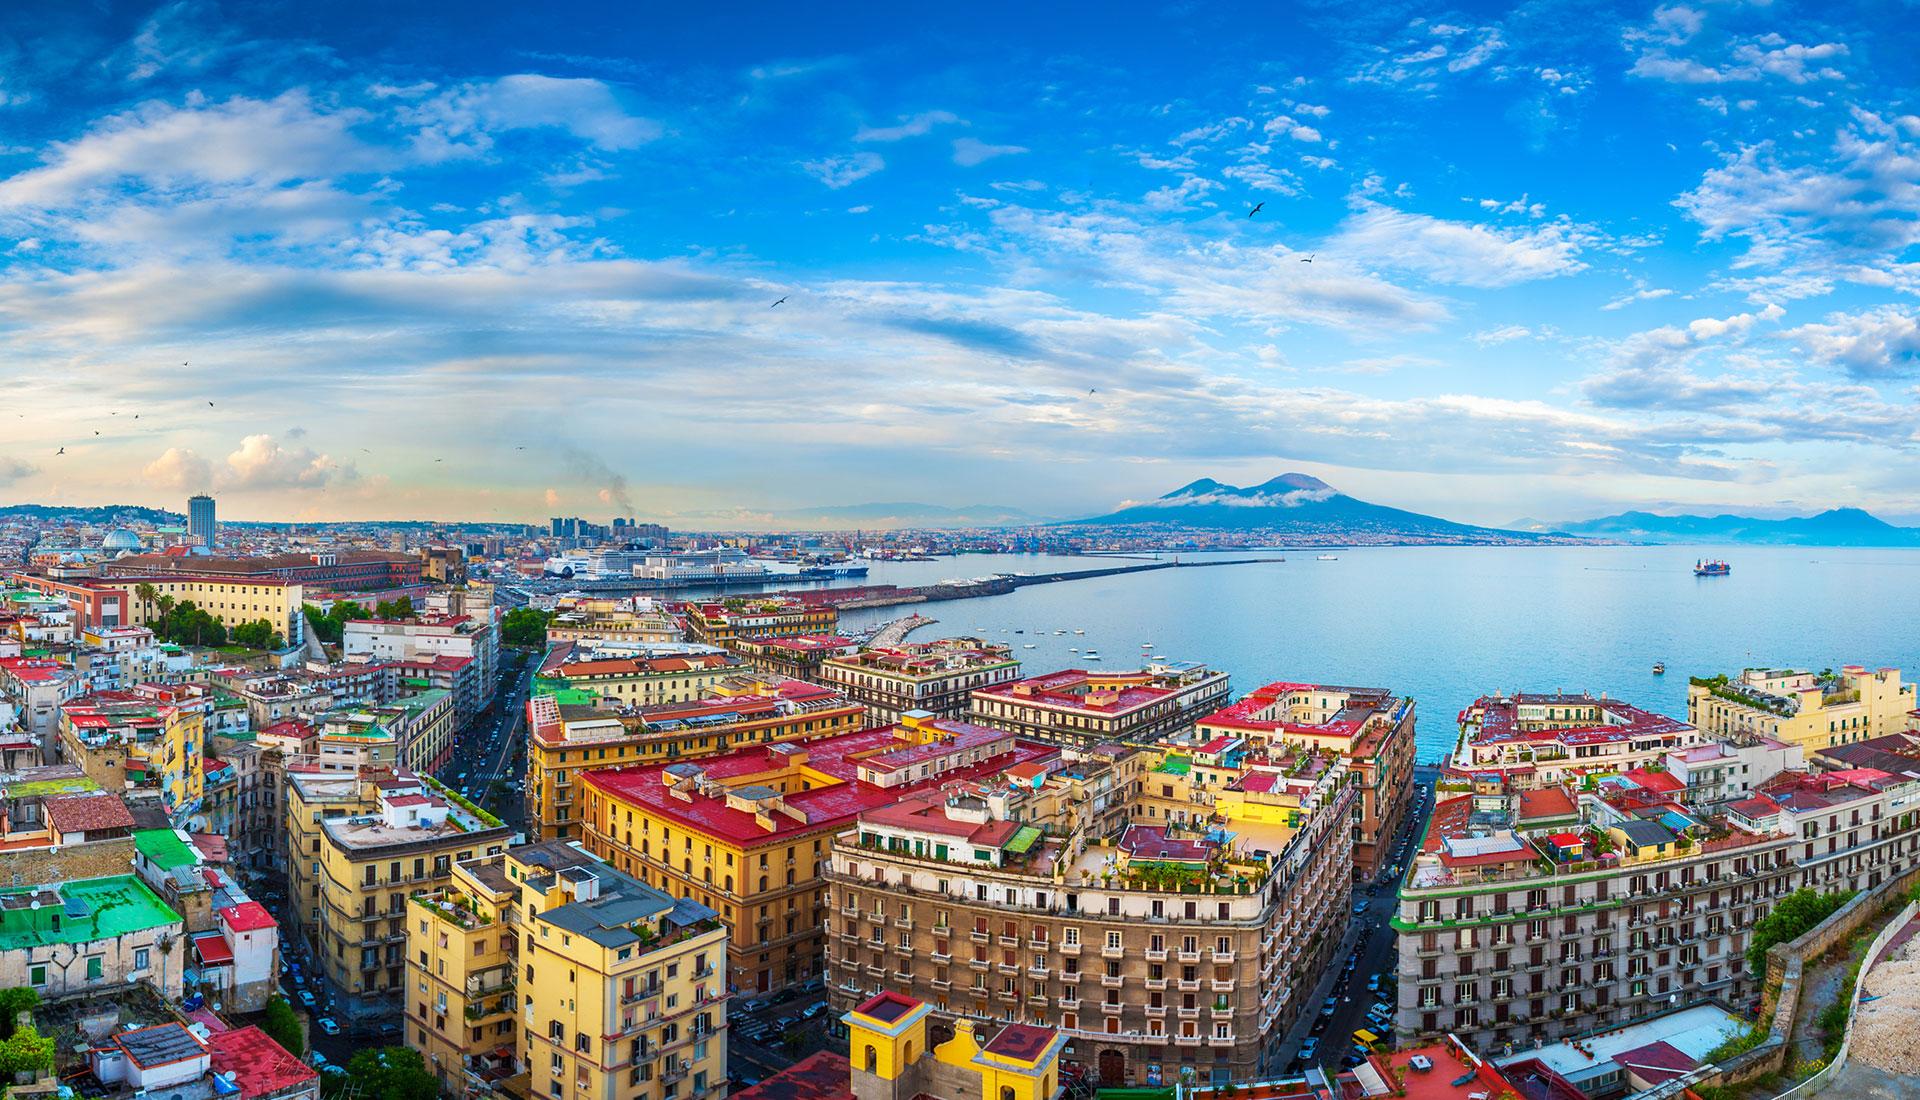 Bella Napoli panorama